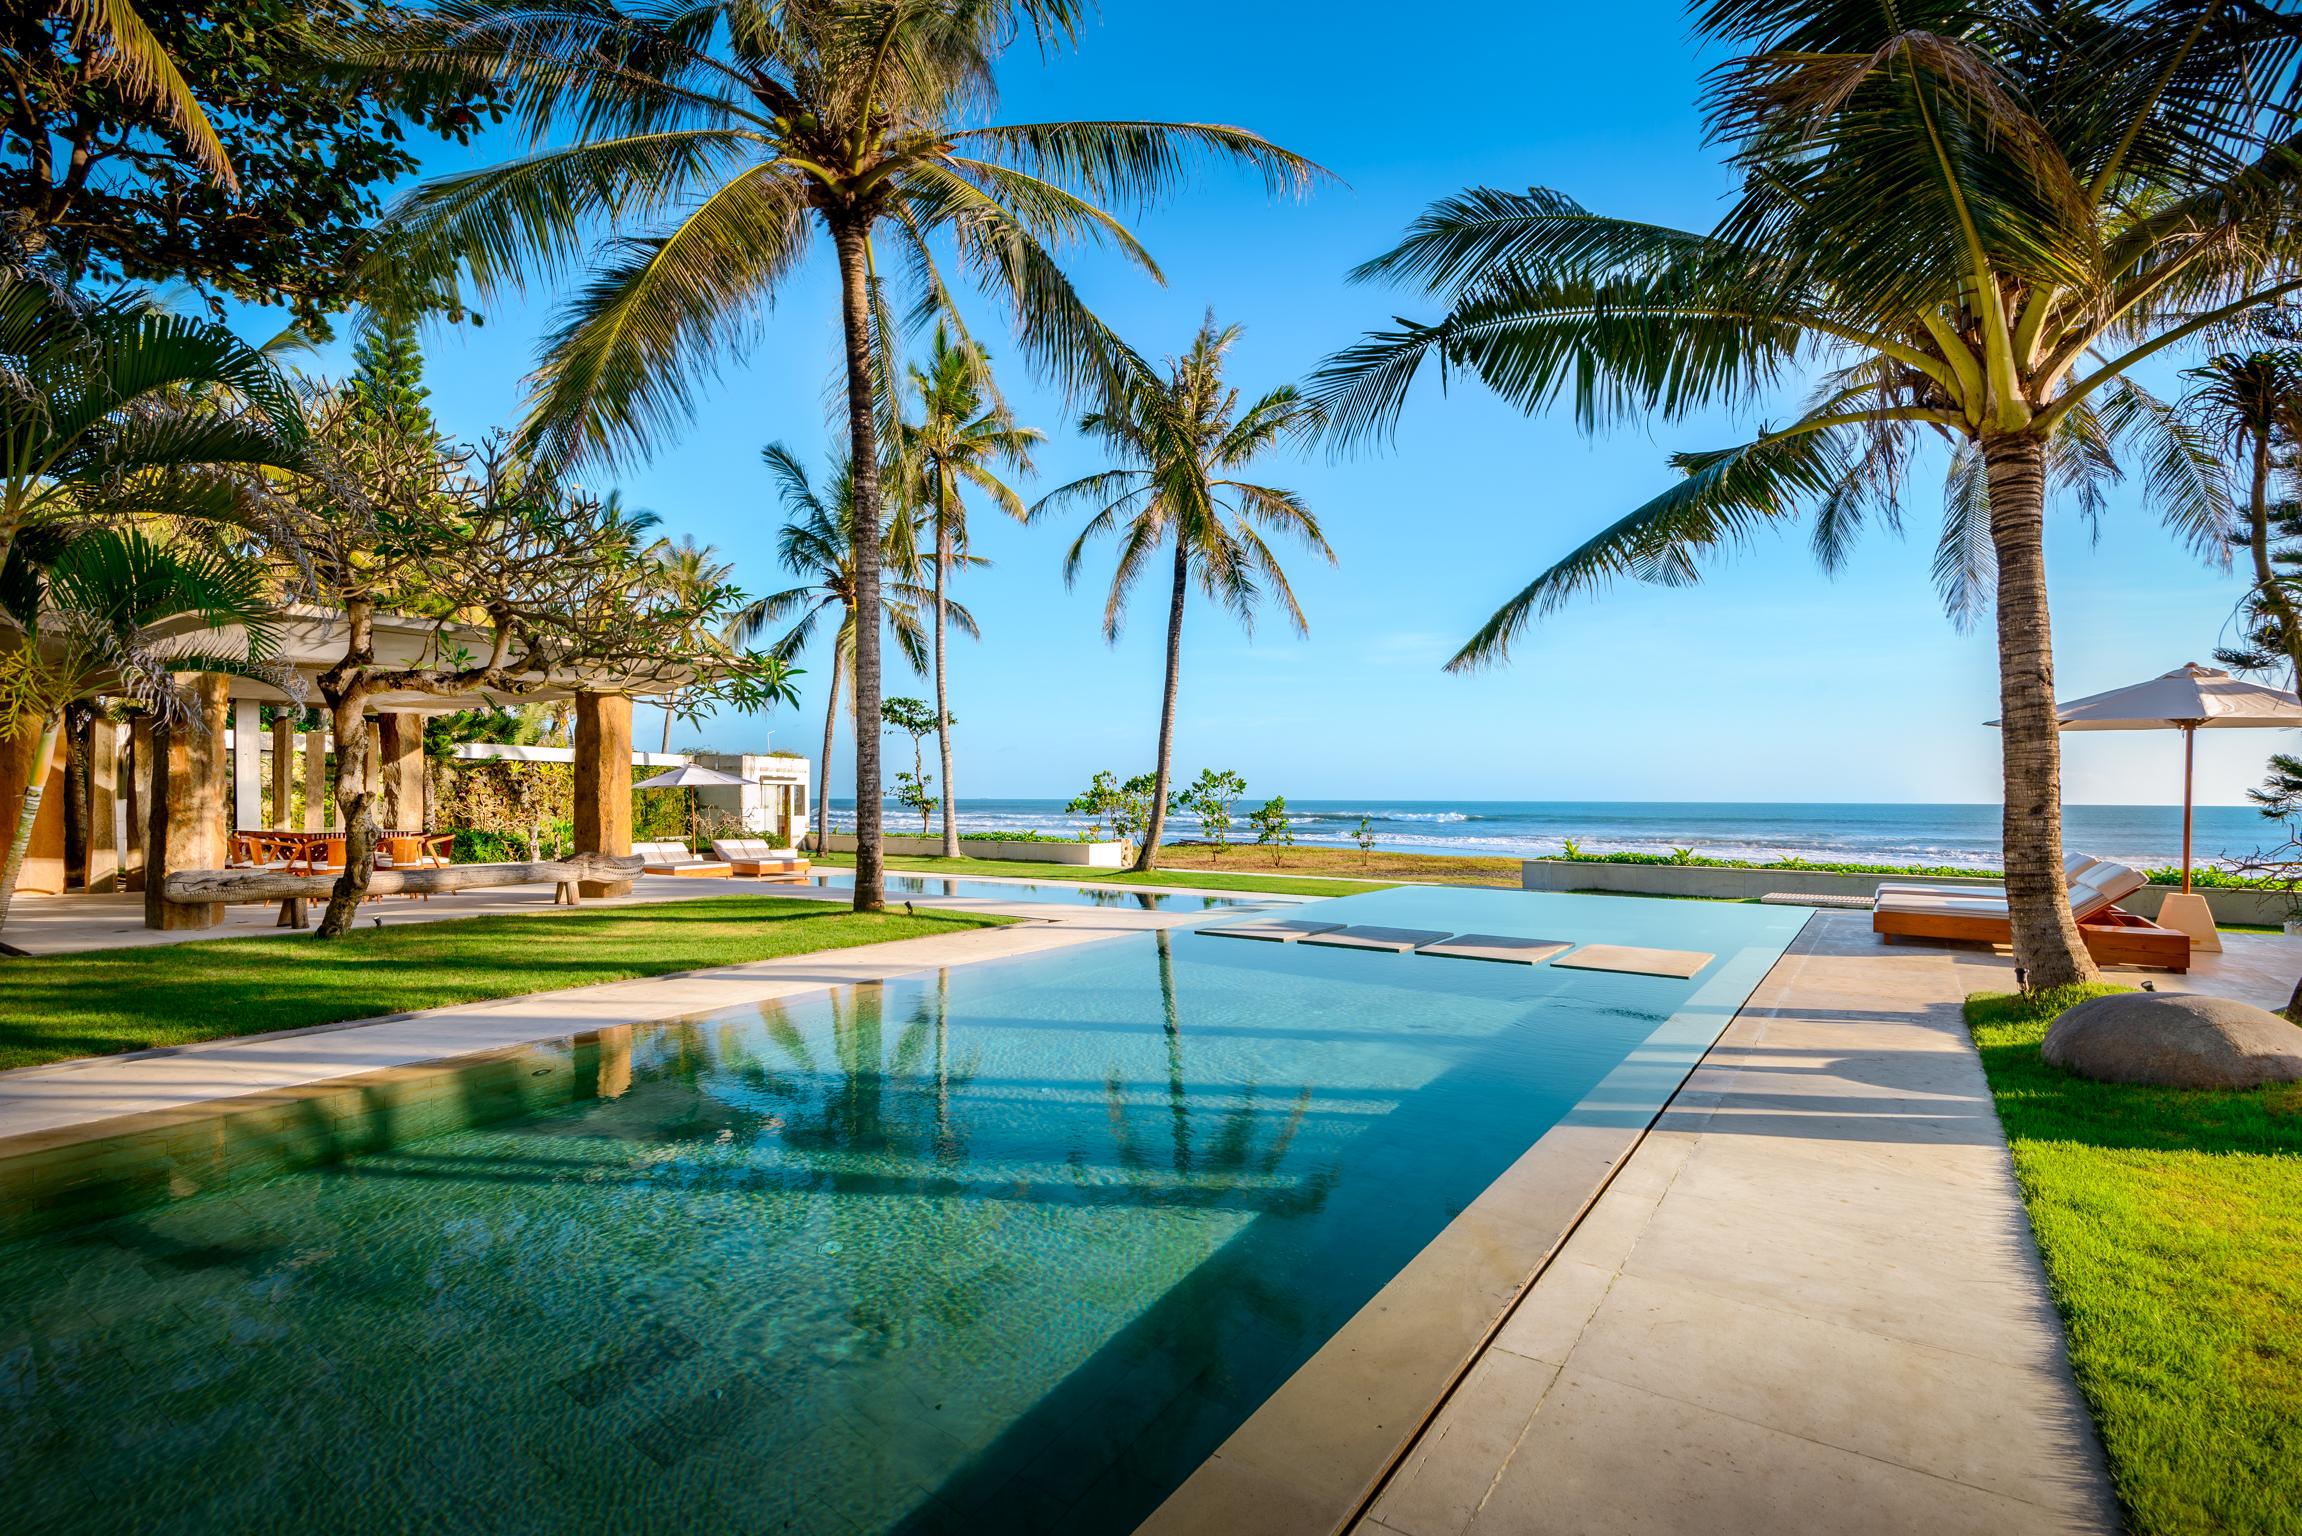 Villa Weddings - Our weddings in sprawling beachfront villas where our couples enjoy views of an Indian ocean sunset.